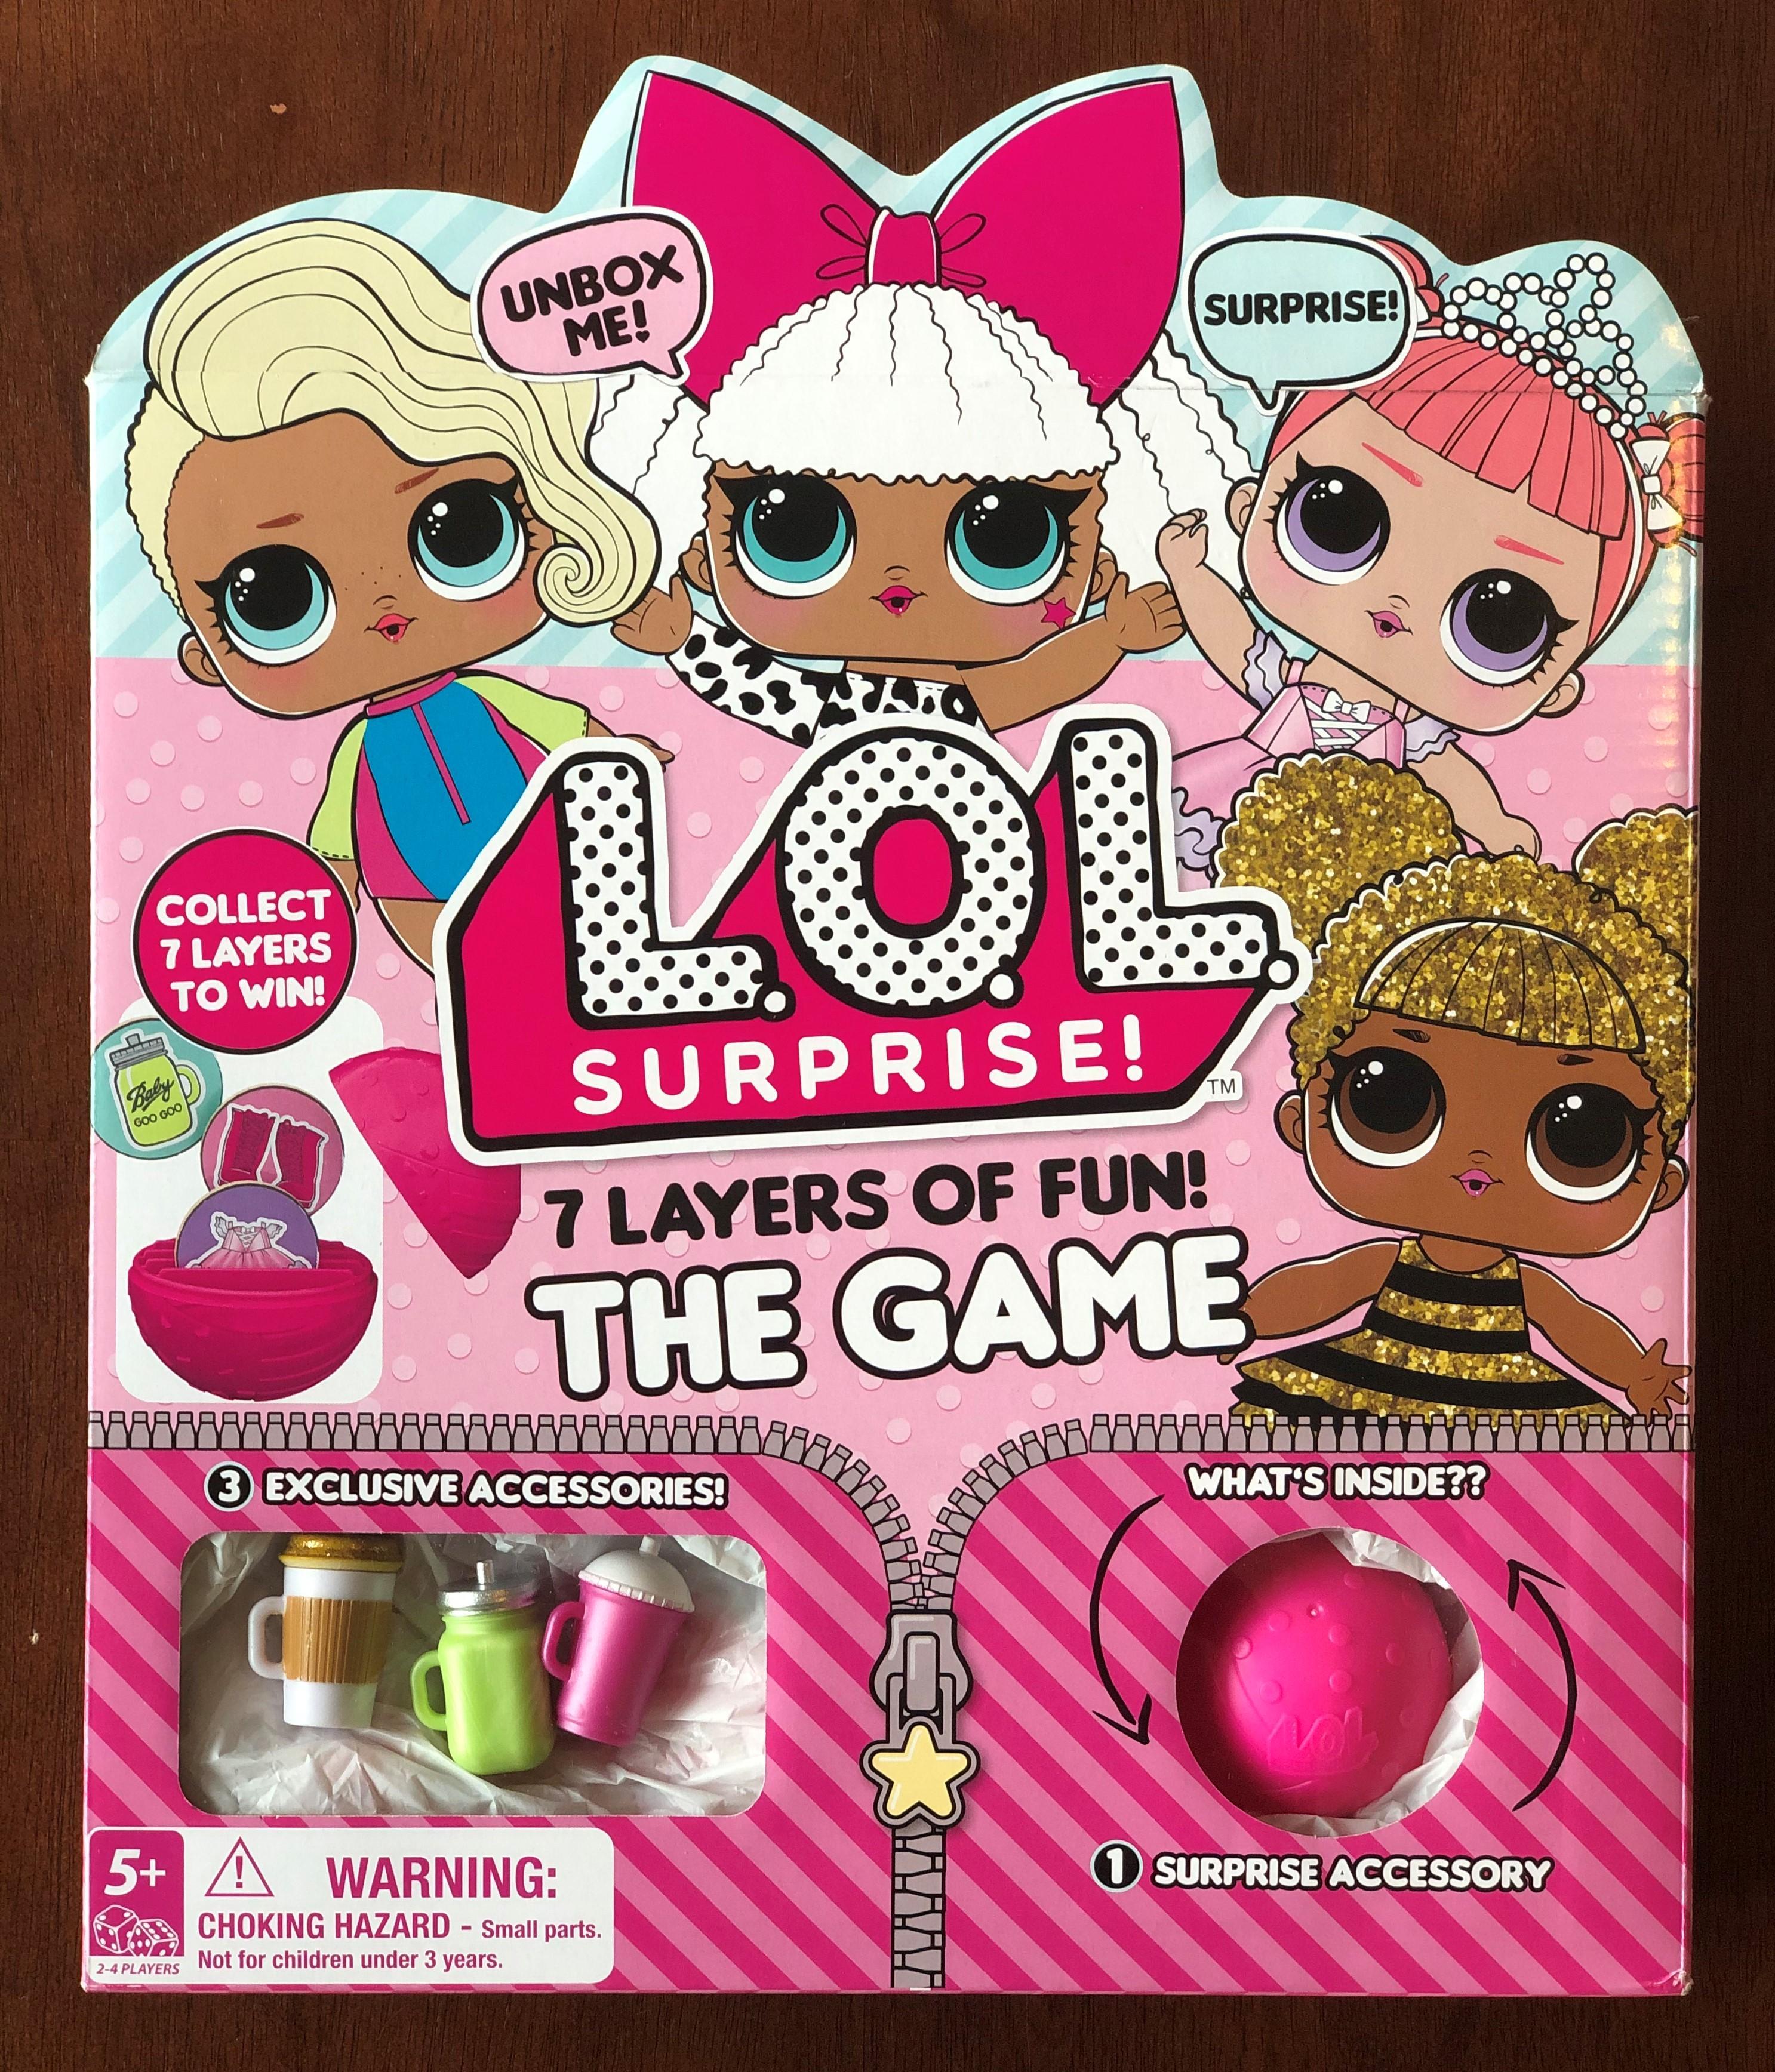 L.O.L. Surprise! 7 Layers of Fun!